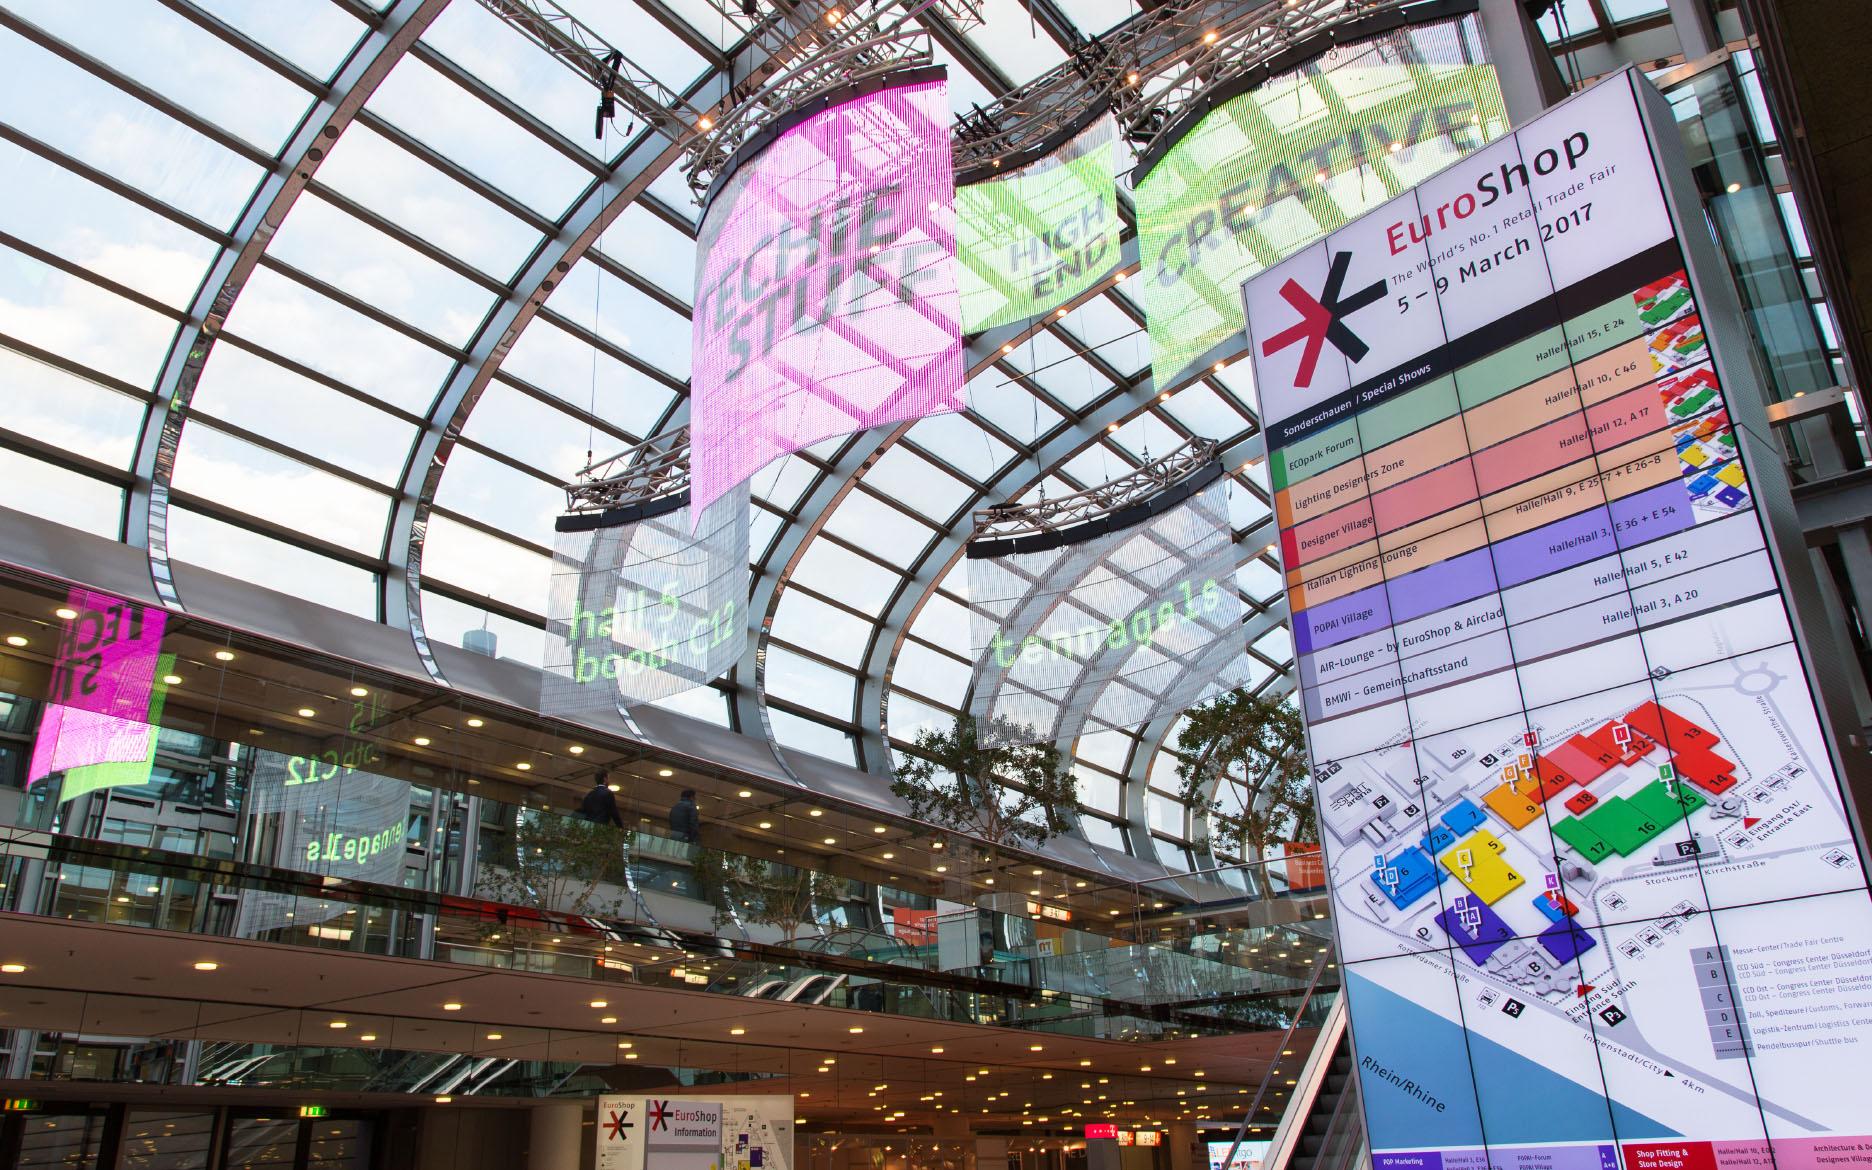 Euroshop 2017, Mall – transparent LED curtain